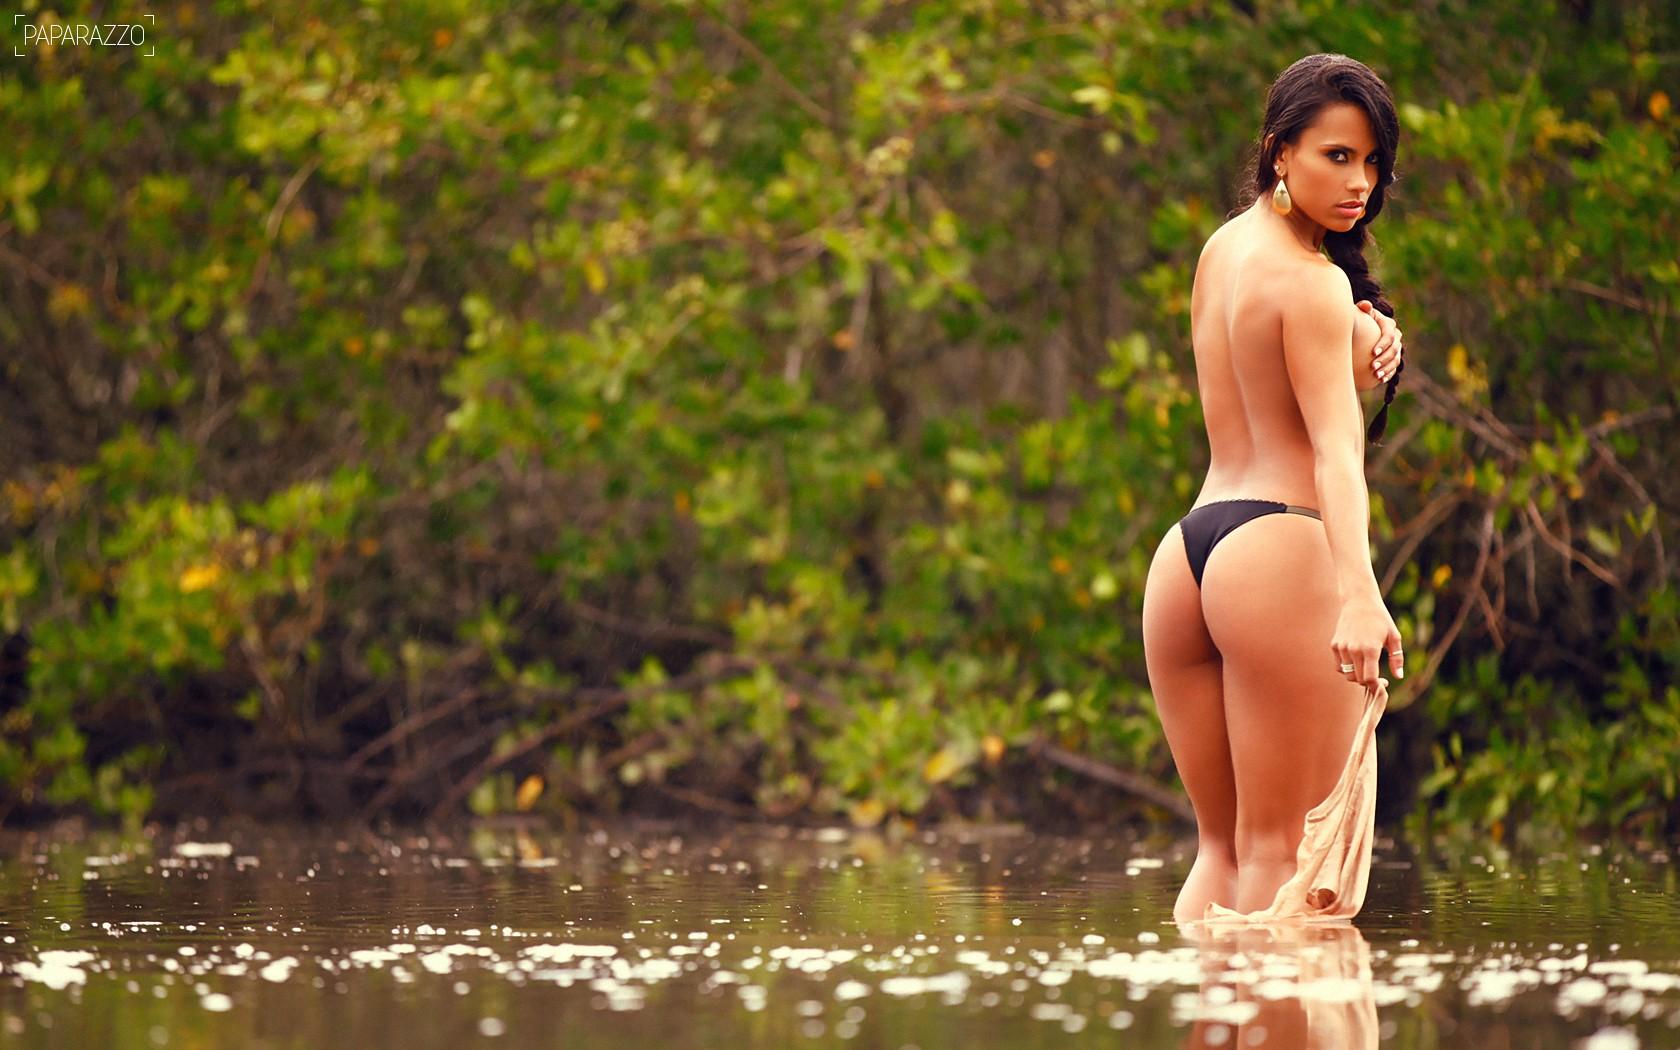 Брюнетка, попка, речка, озеро, бикини, взгляд, пруд широкоформатные